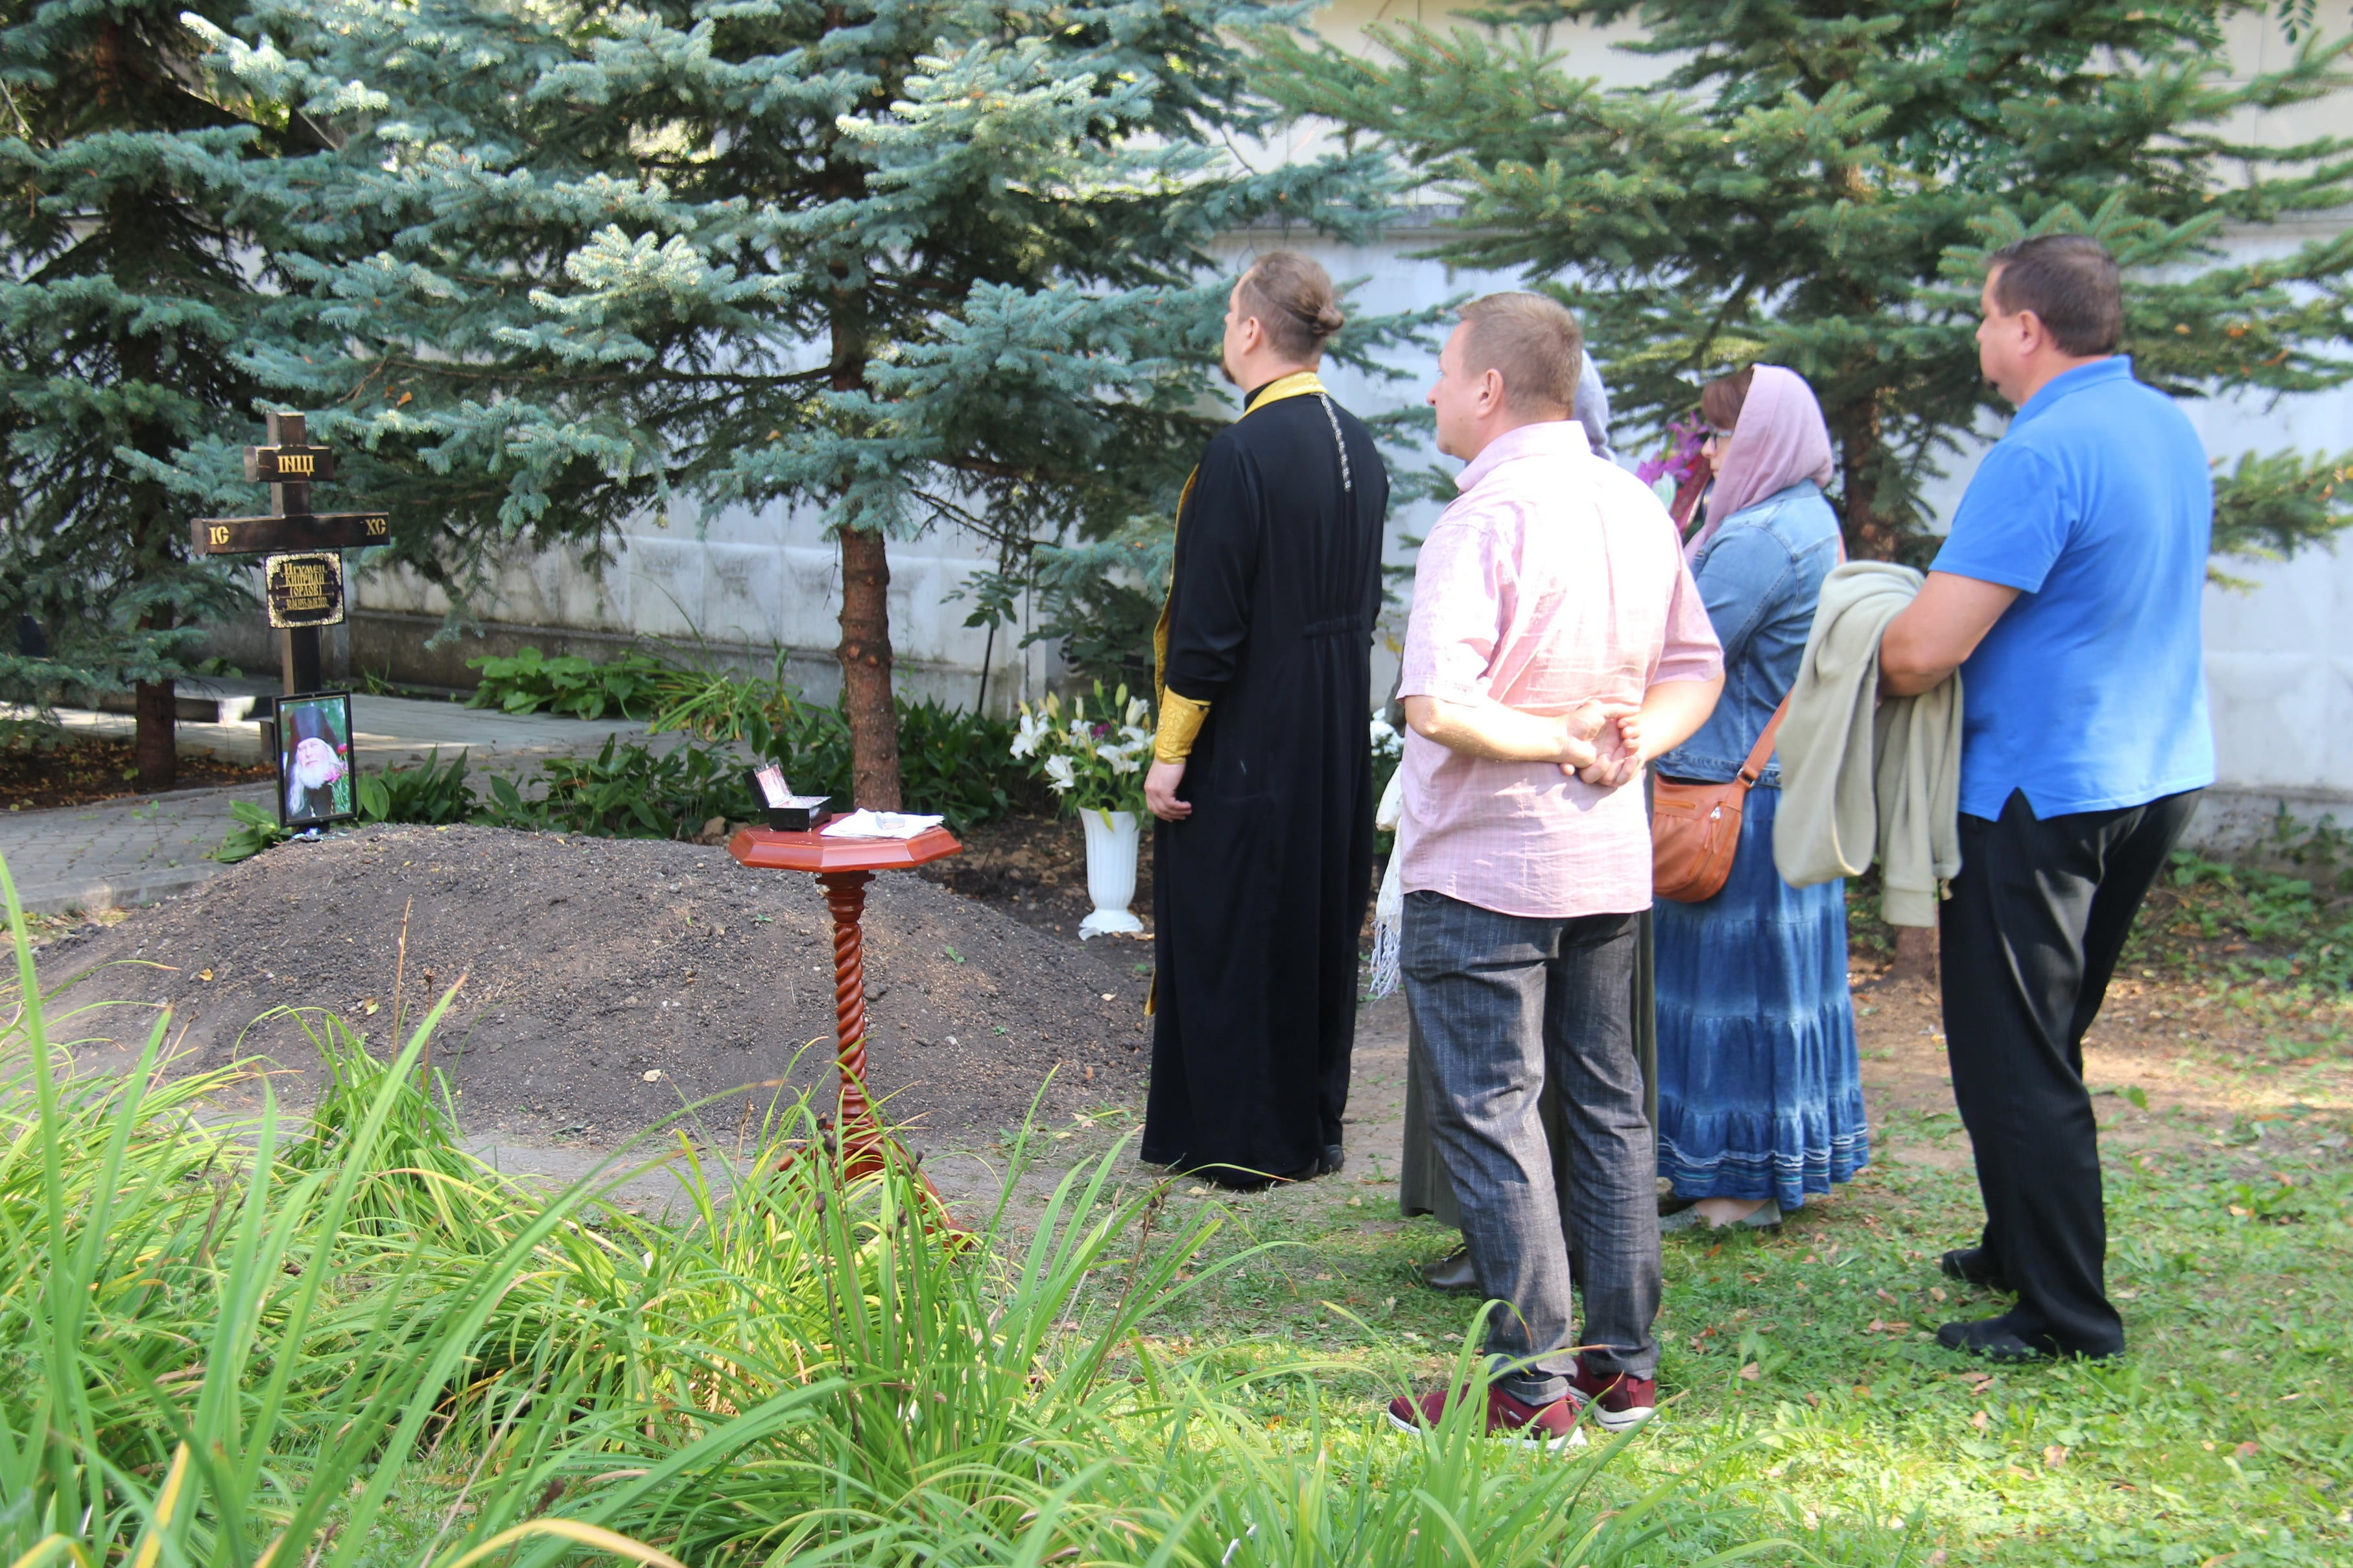 http://monuspen.ru/photoreports/81b329e91db1194e3c091aa1d0224590.JPG